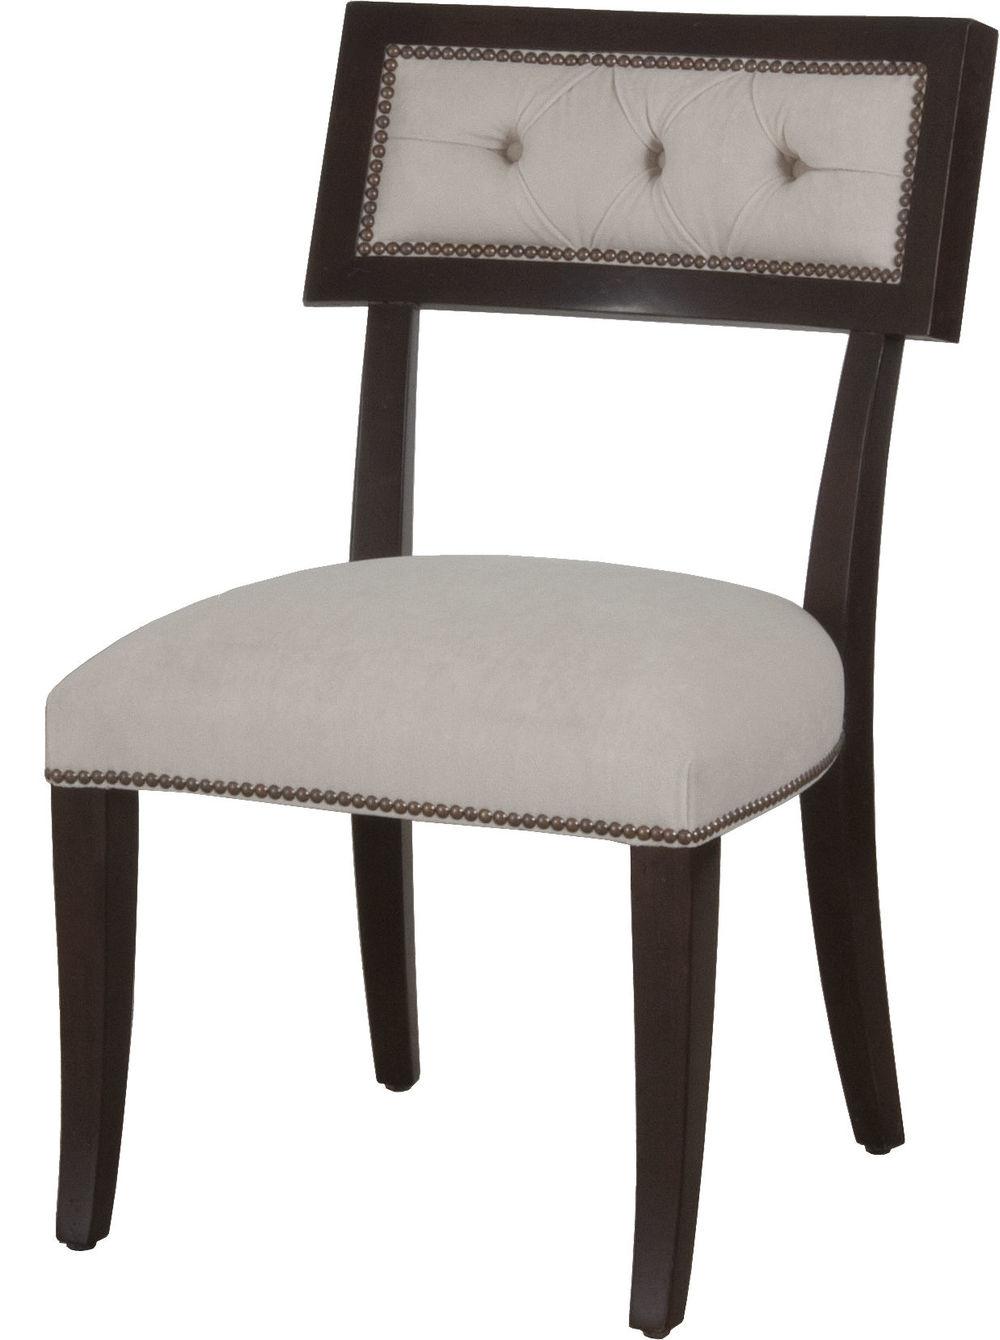 Lorts - Side Chair